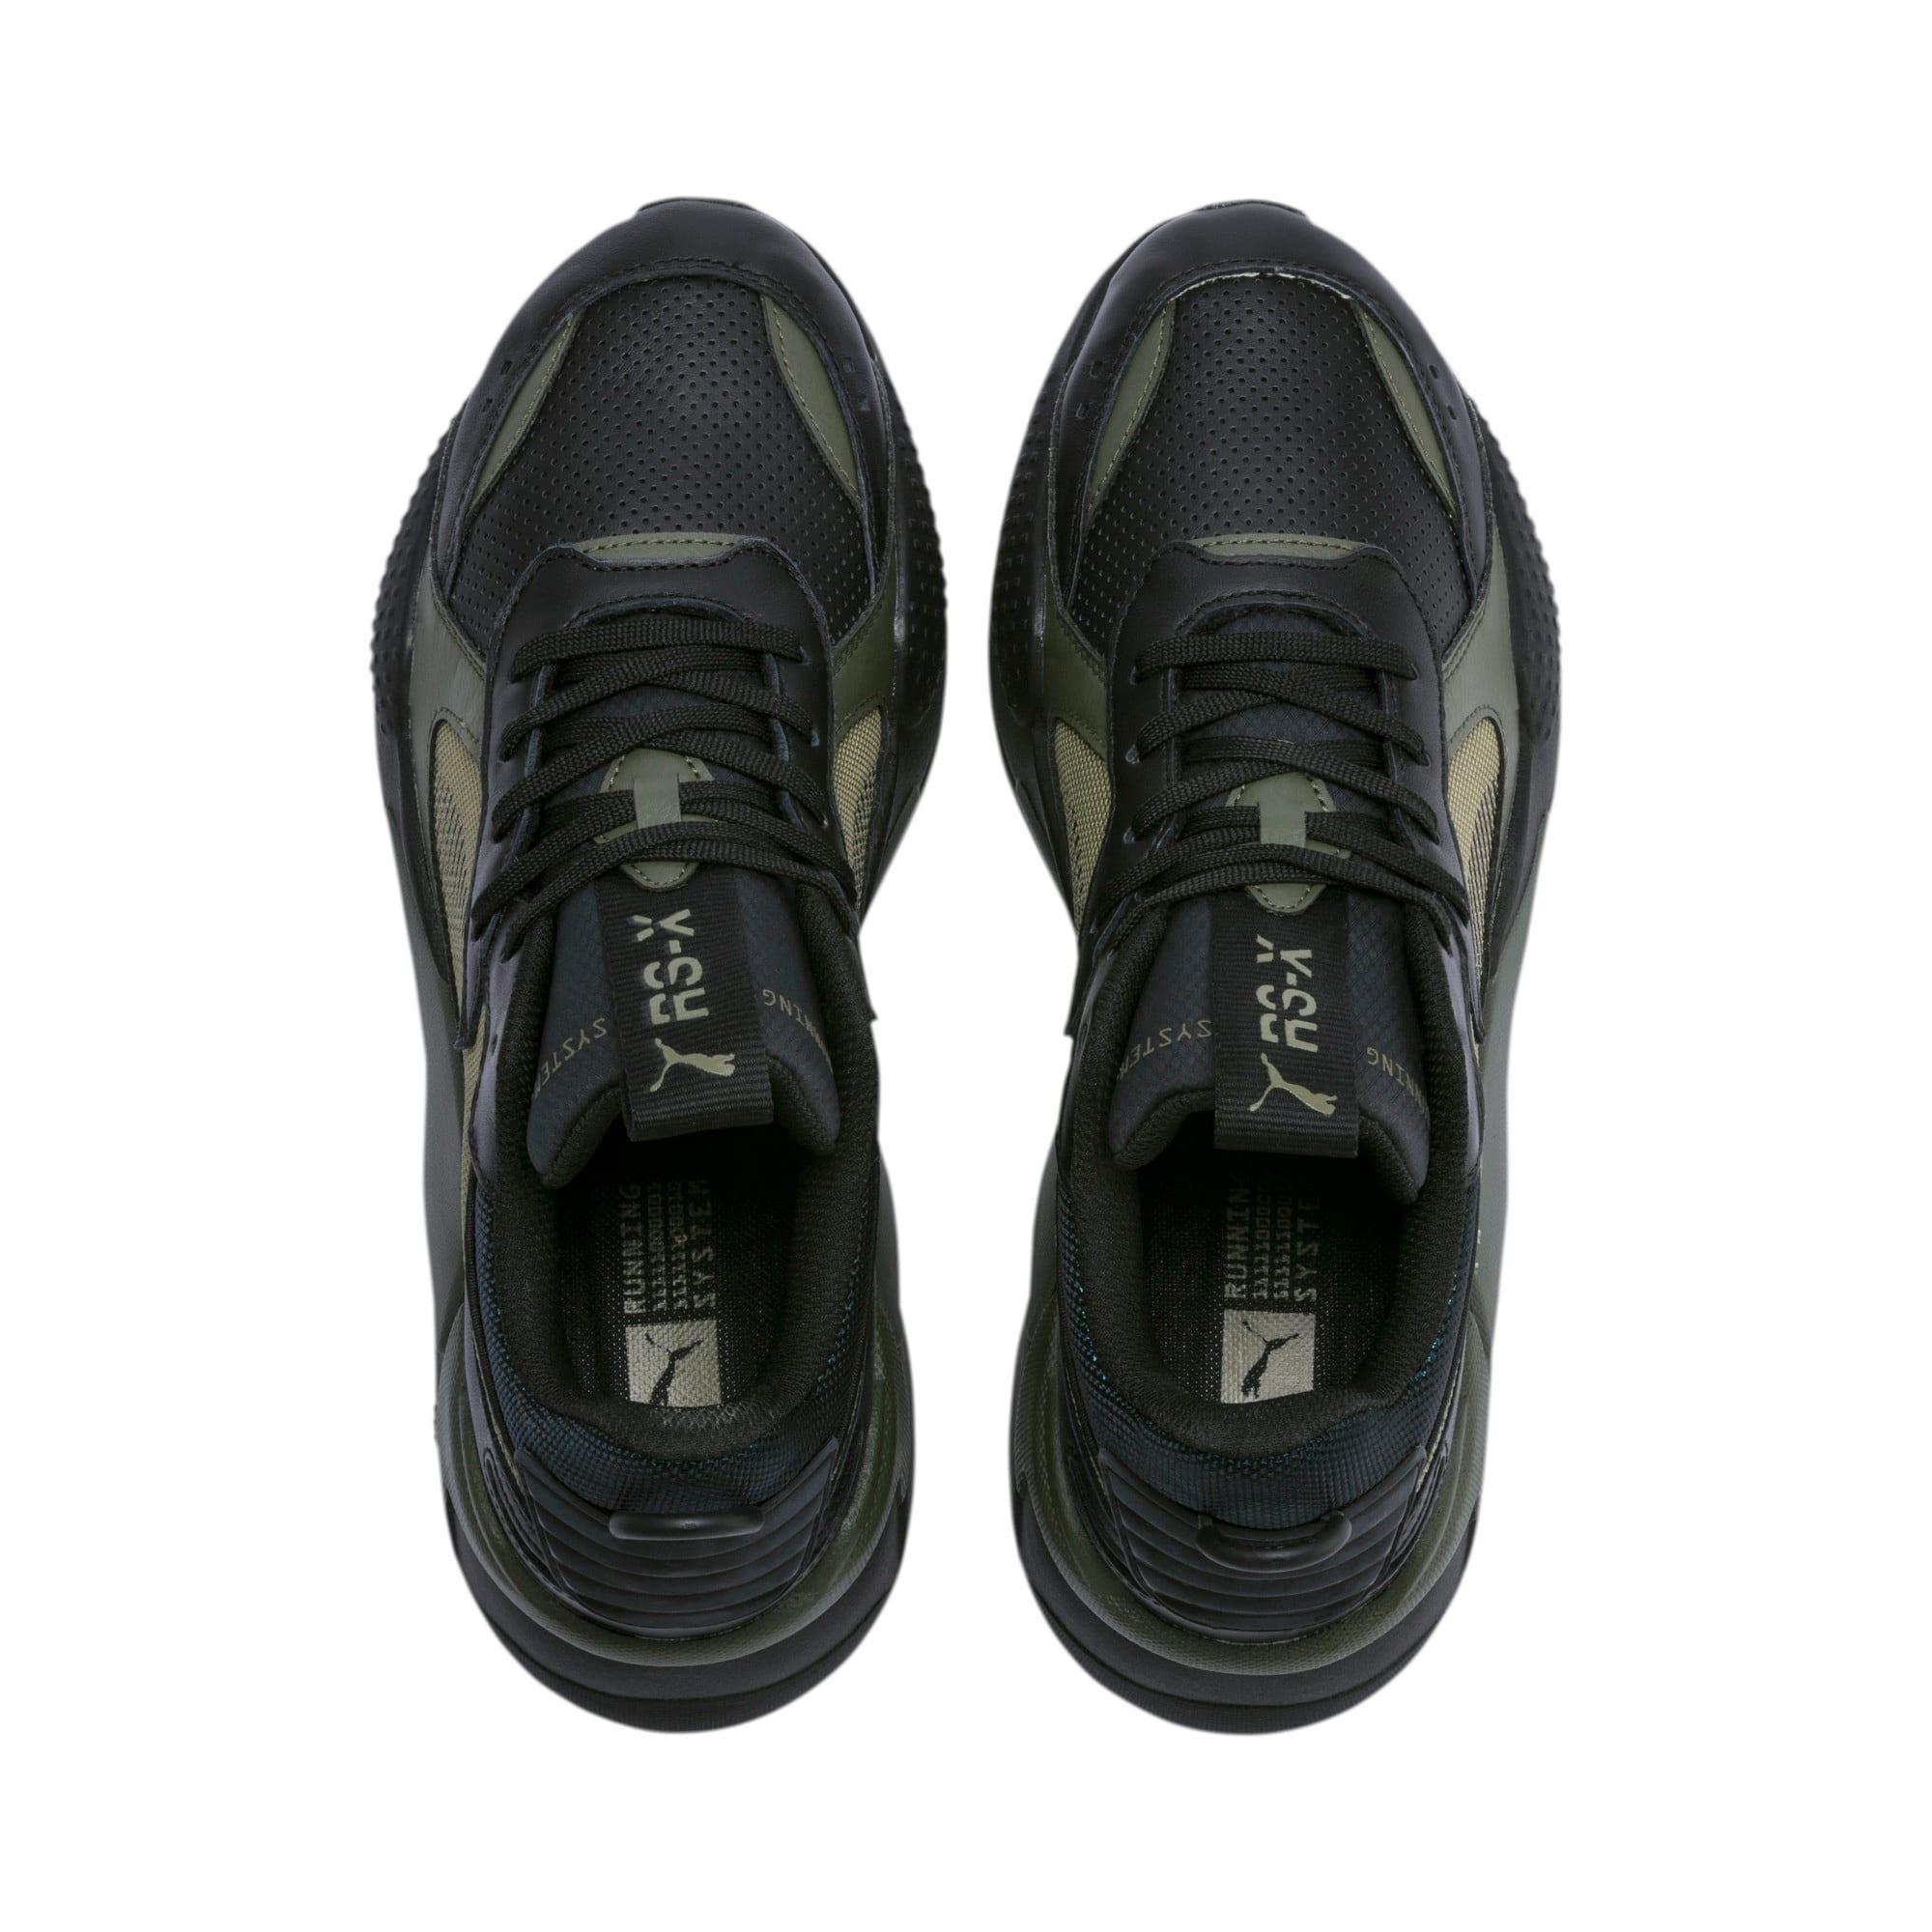 Thumbnail 8 of RS-X Winterized Sneakers, Puma Black-Burnt Olive, medium